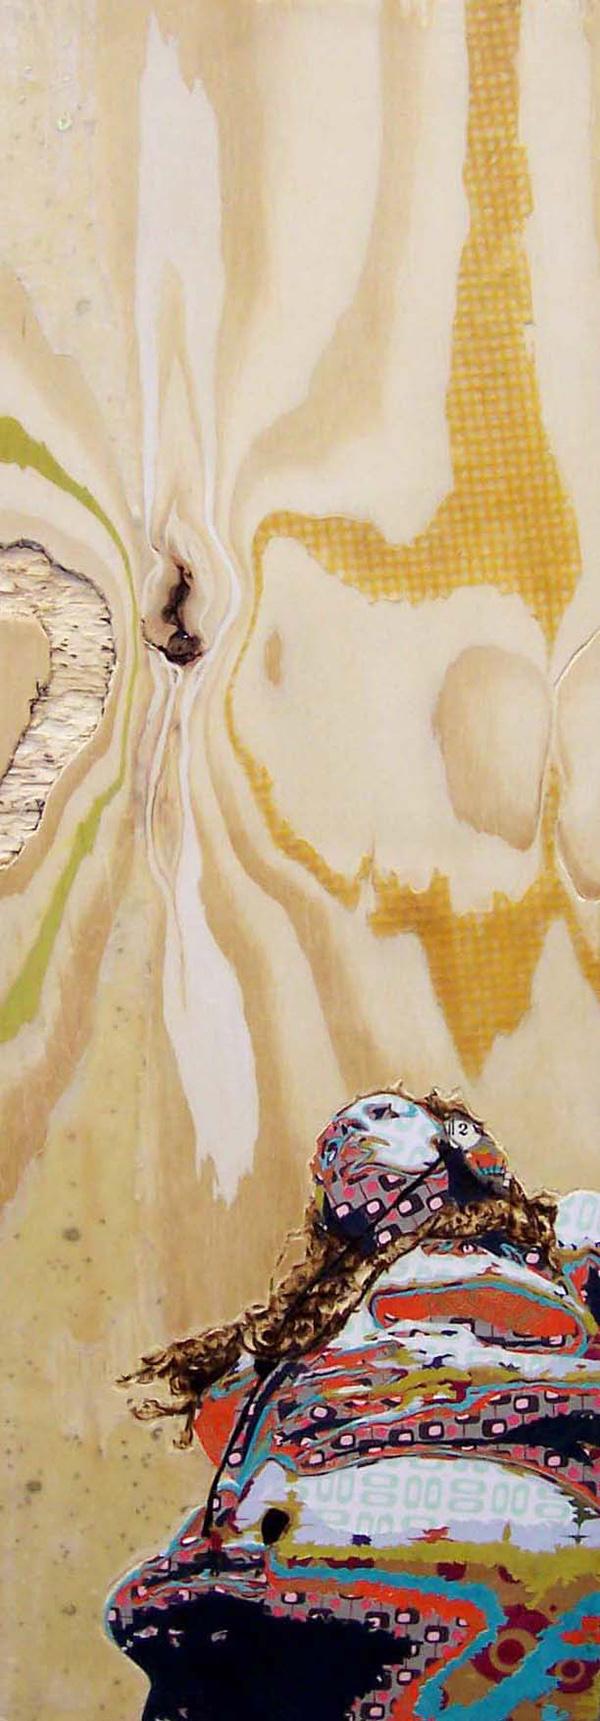 Lorna Williams-Aesthetic Space-2006-mixed media on wood panel-24x9.jpg